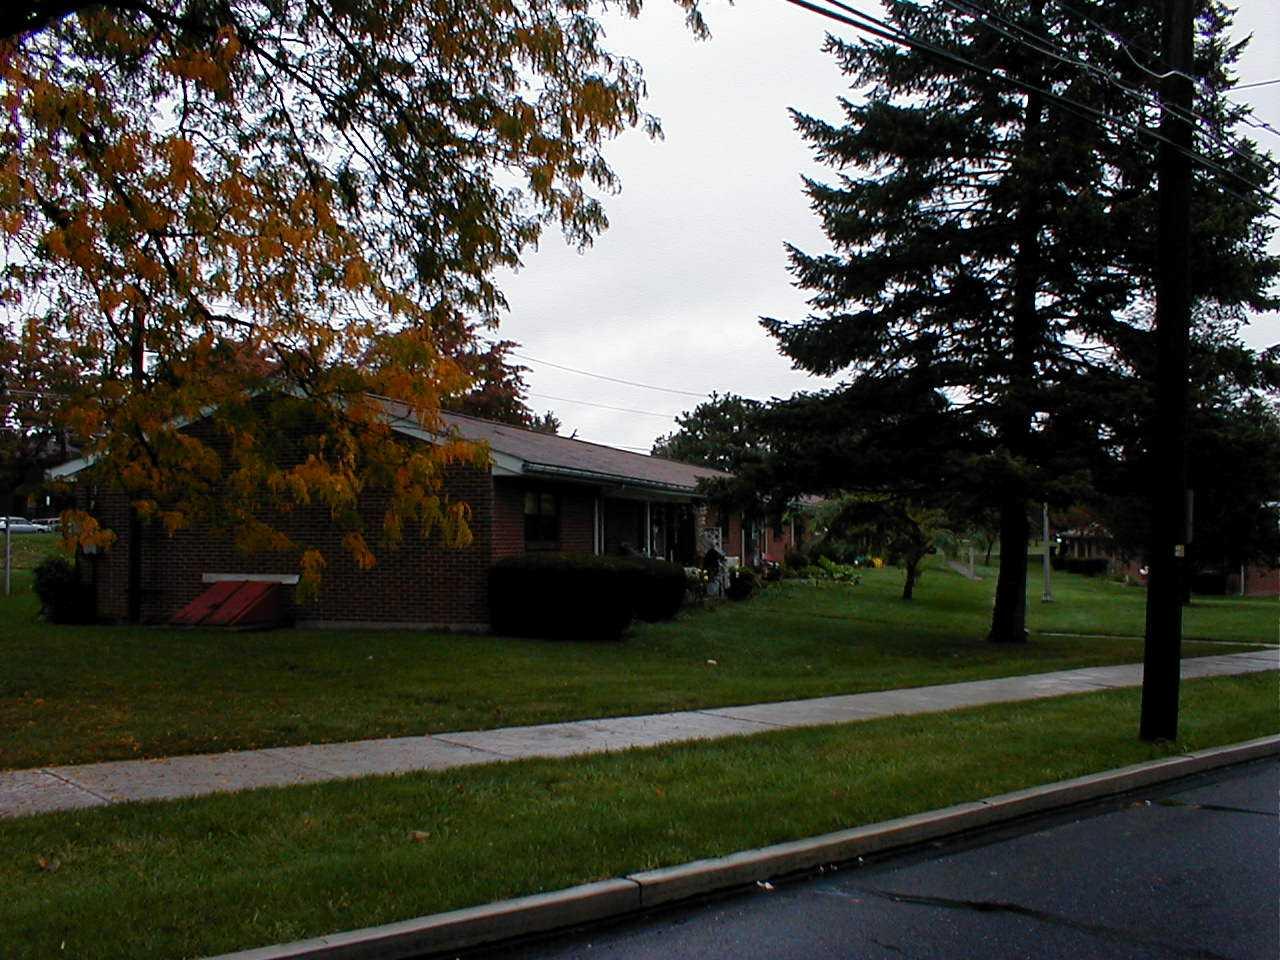 Image of Pfeifle Homes in Bethlehem, Pennsylvania